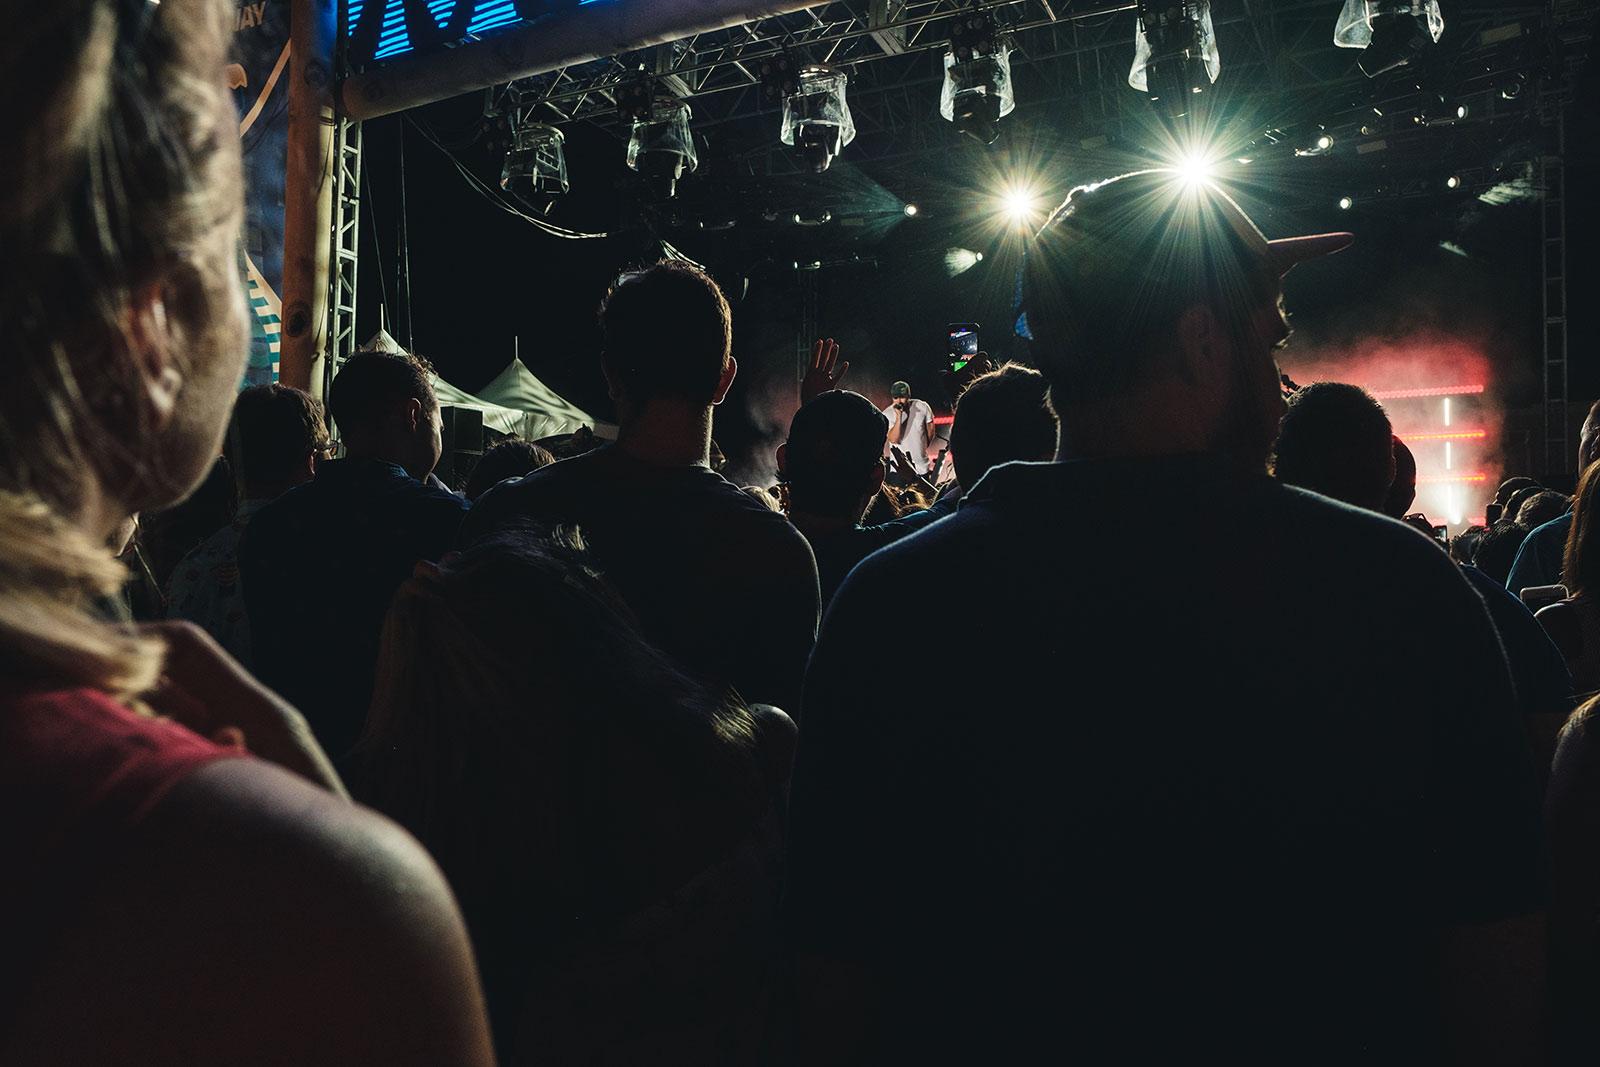 Events — XRAYDJ PHOTOGRAPHY